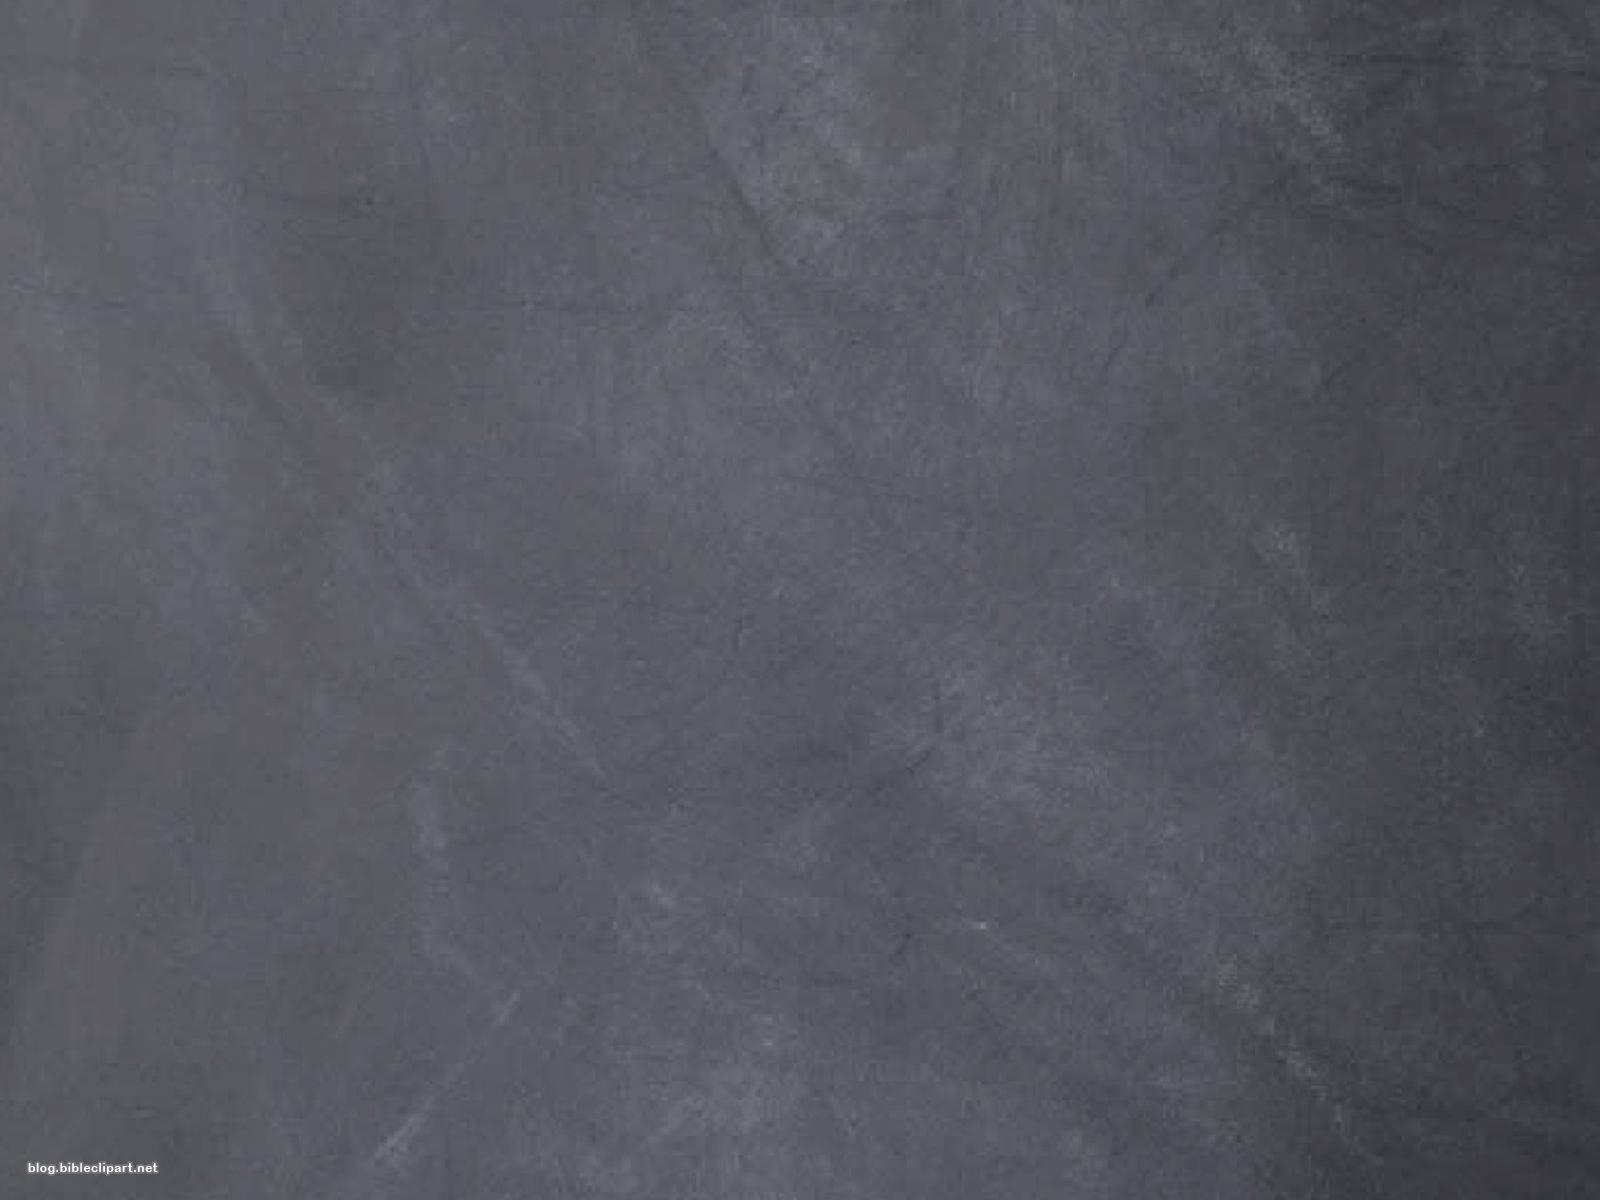 Classic Blackboard Background